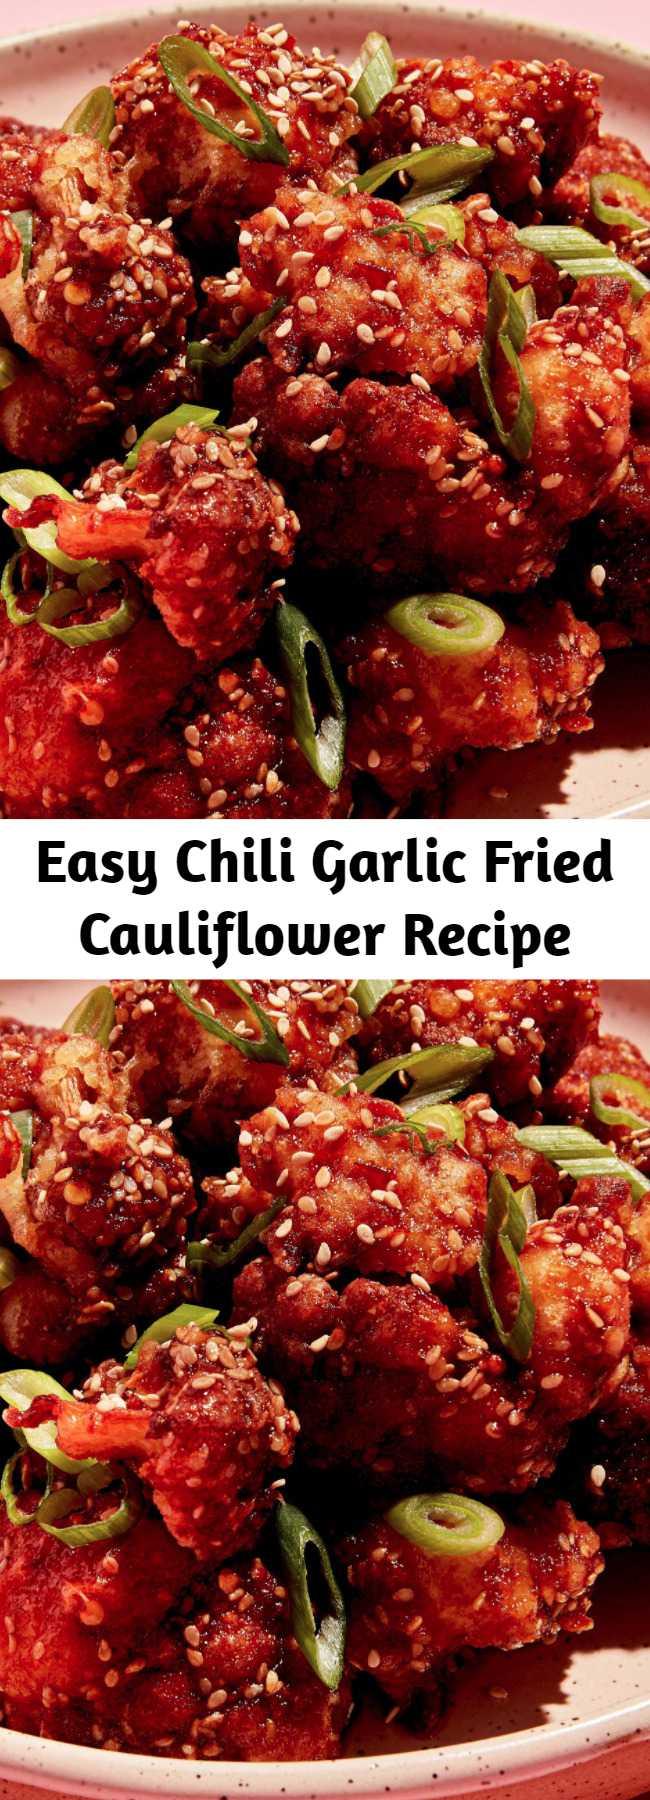 Easy Chili Garlic Fried Cauliflower Recipe - Go ahead and double this Chili Garlic Fried Cauliflower recipe and you'll have no regrets. #food #easyrecipe #vegetarian #familydinner #dinner